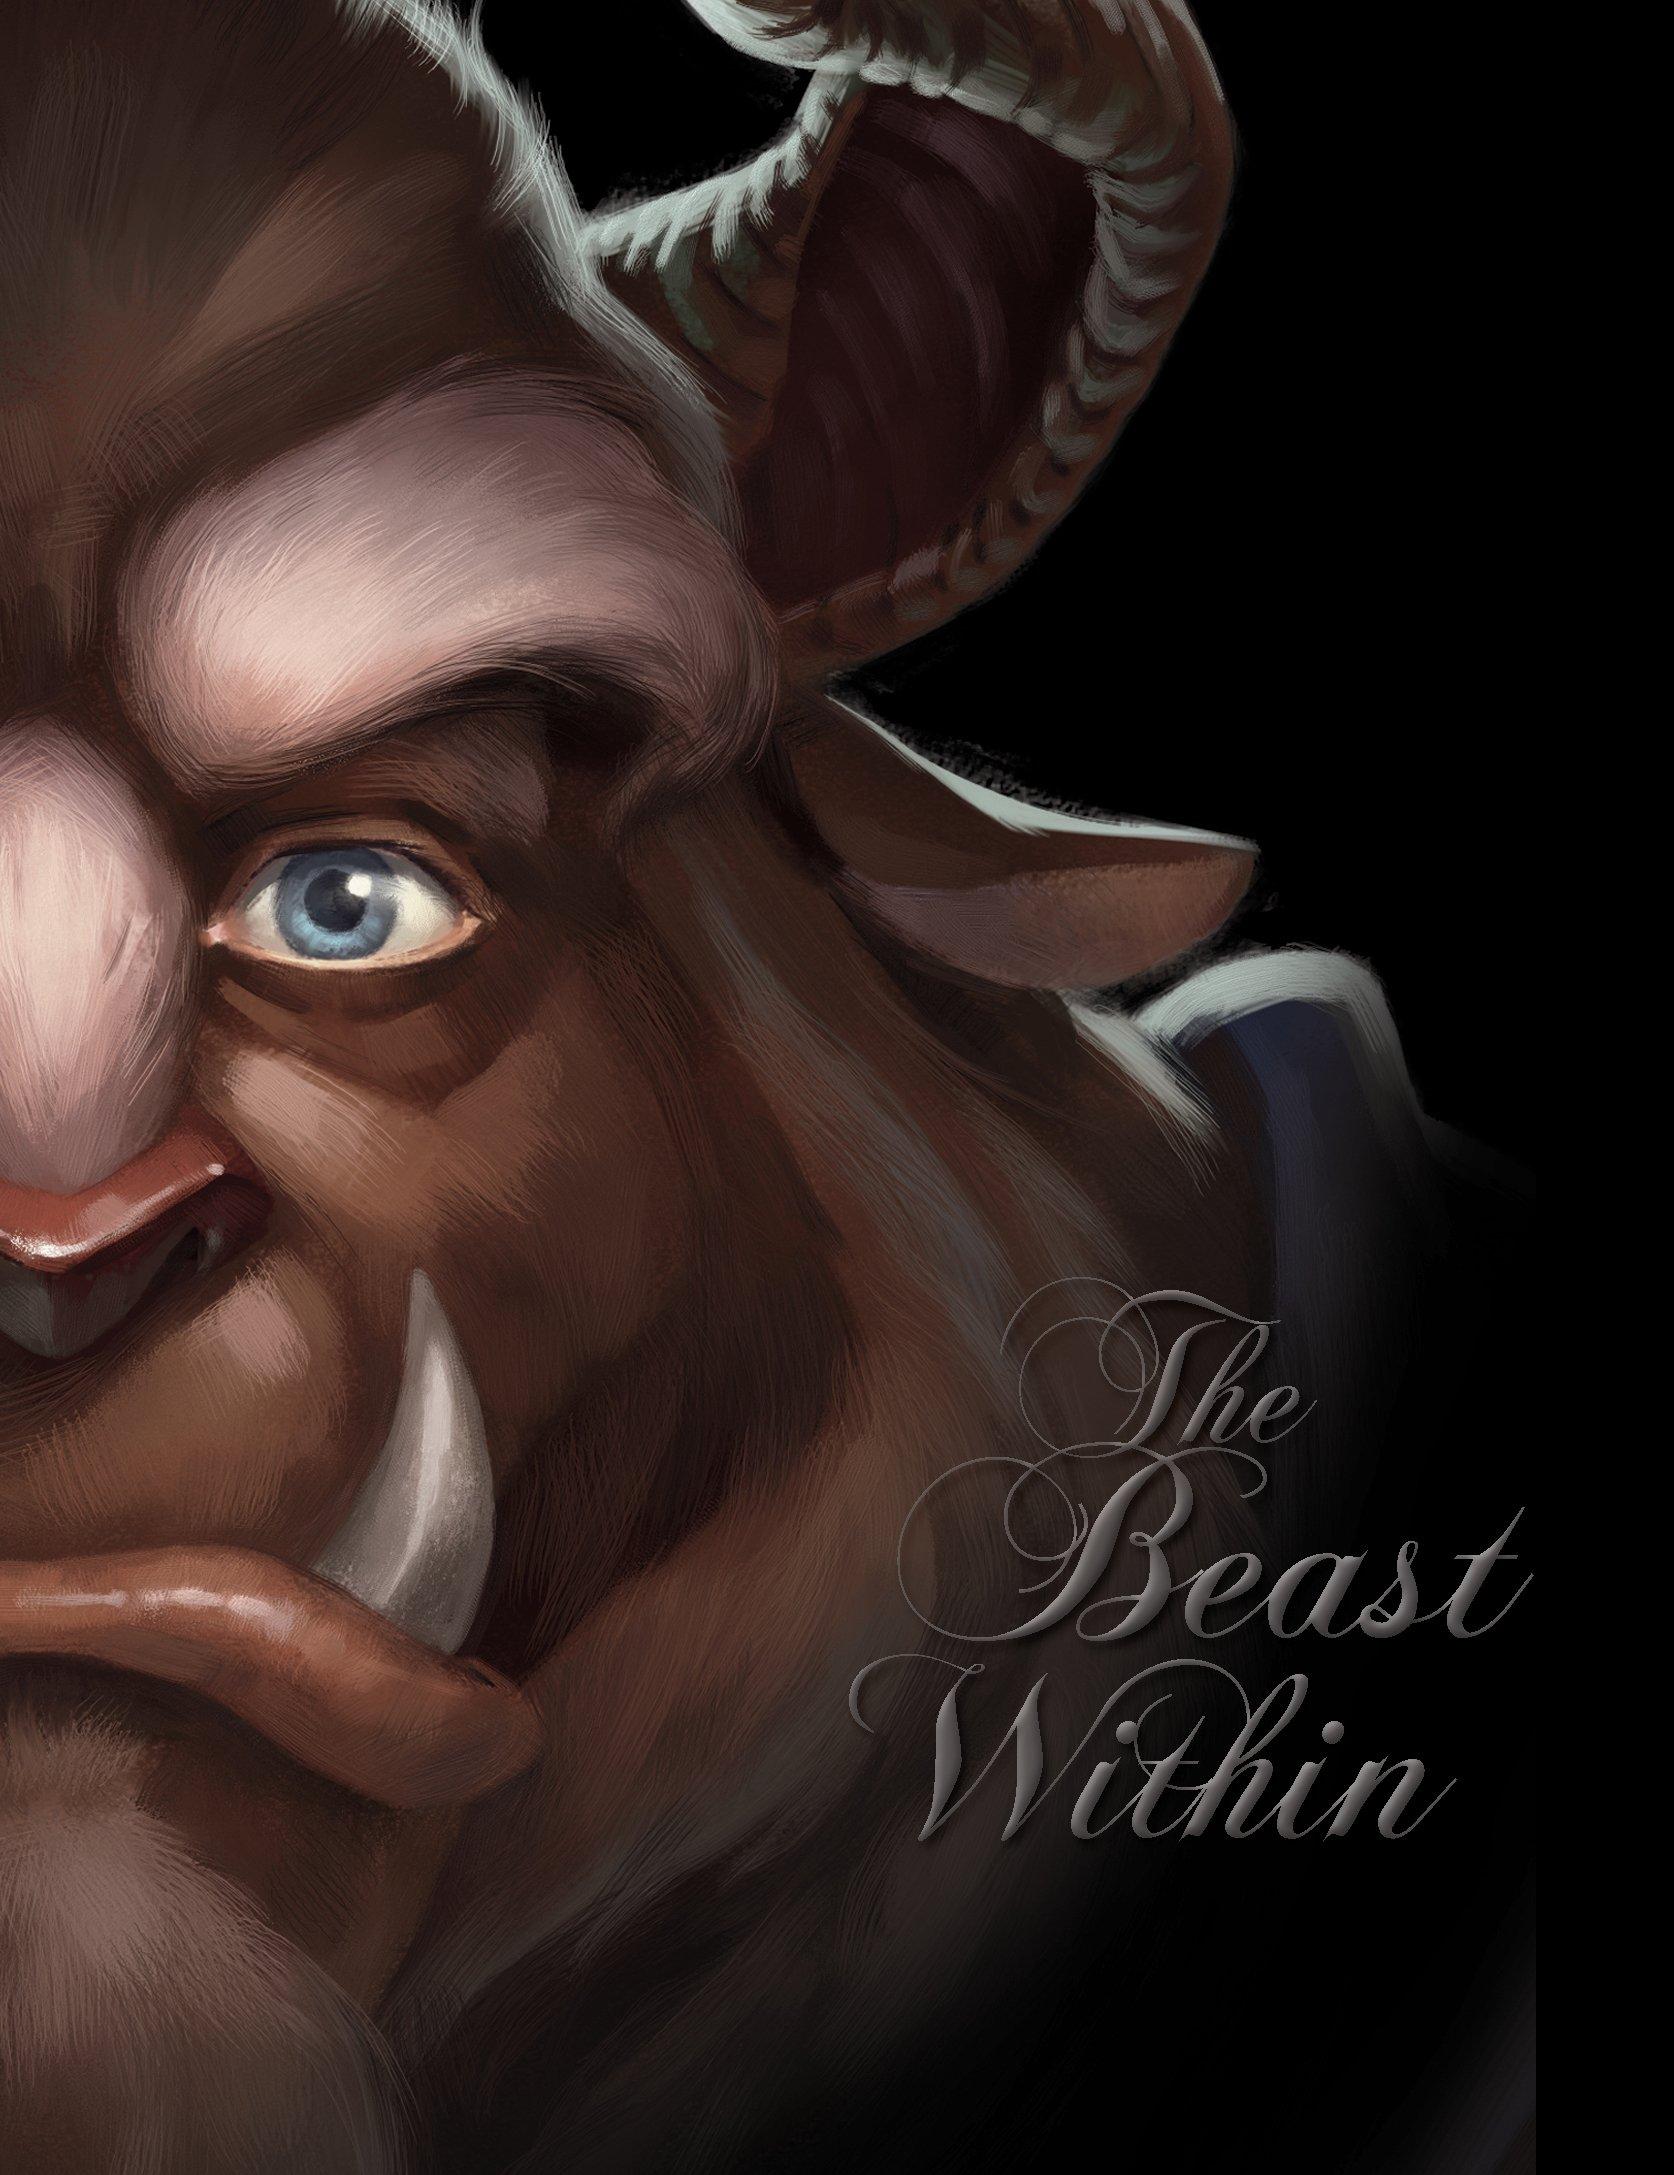 The Beast Within: A Tale of Beauty's Prince | Disney Wiki | Fandom